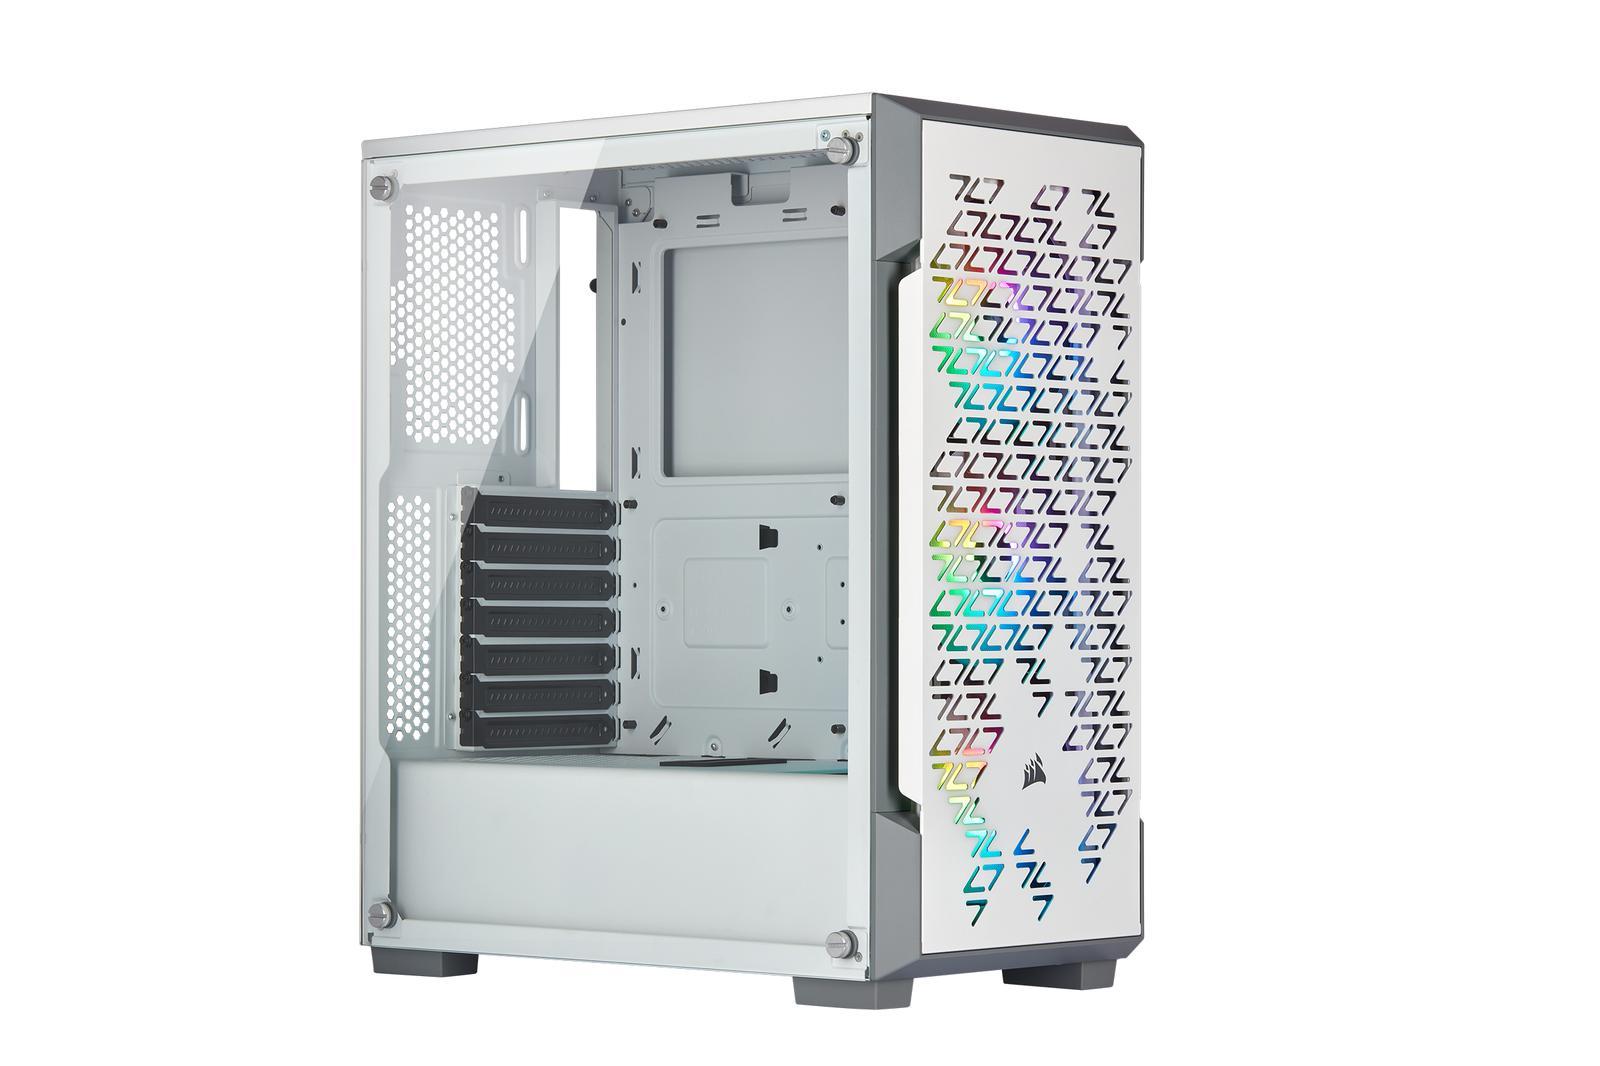 Corsair iCUE 220T RGB Airflow ATX Mid Tower Case